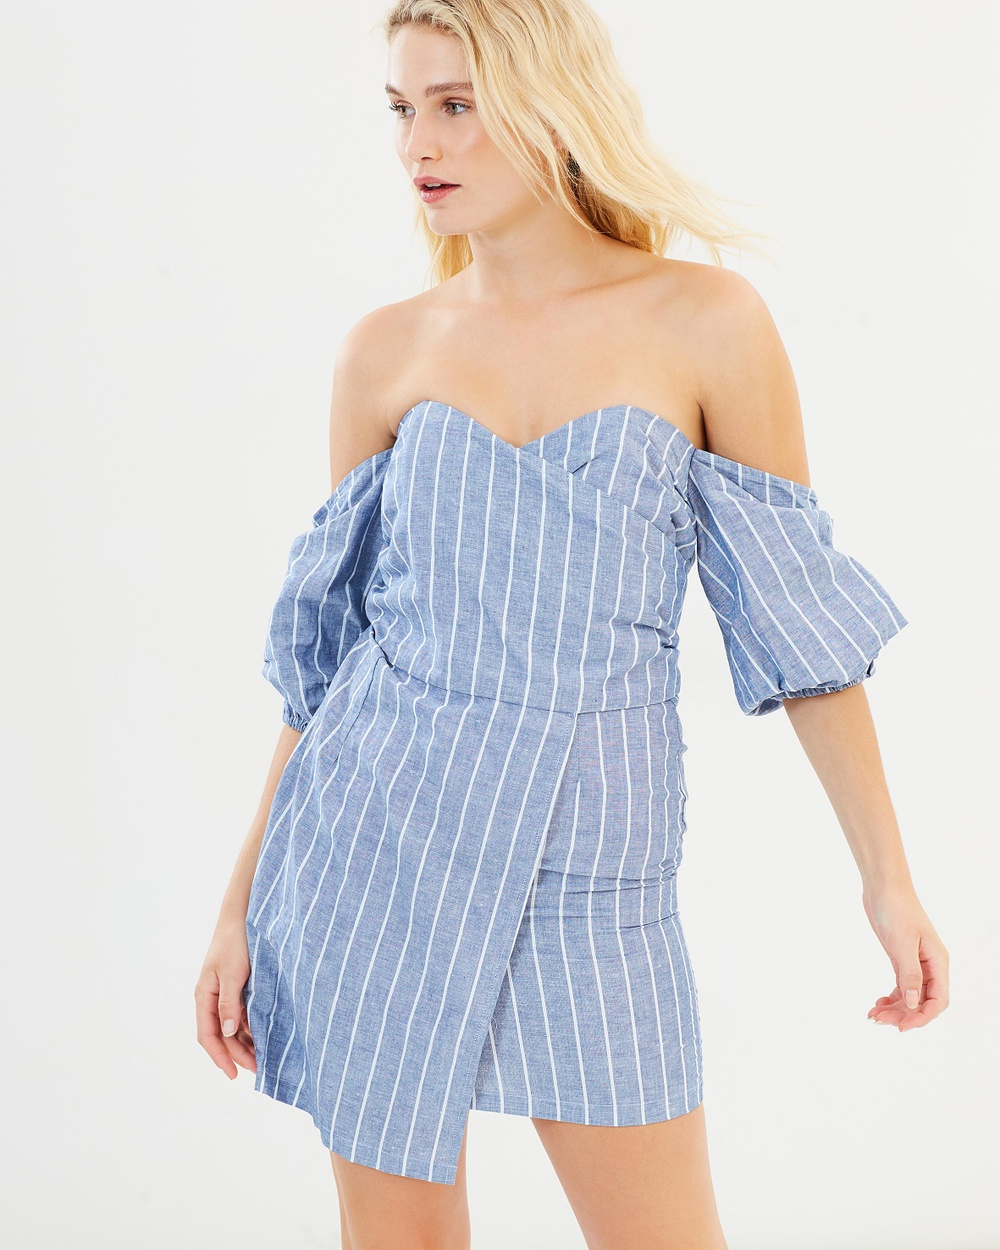 MLM Label Ana Shoulder Wrap Dress Dresses Blue Stripe Ana Shoulder Wrap Dress